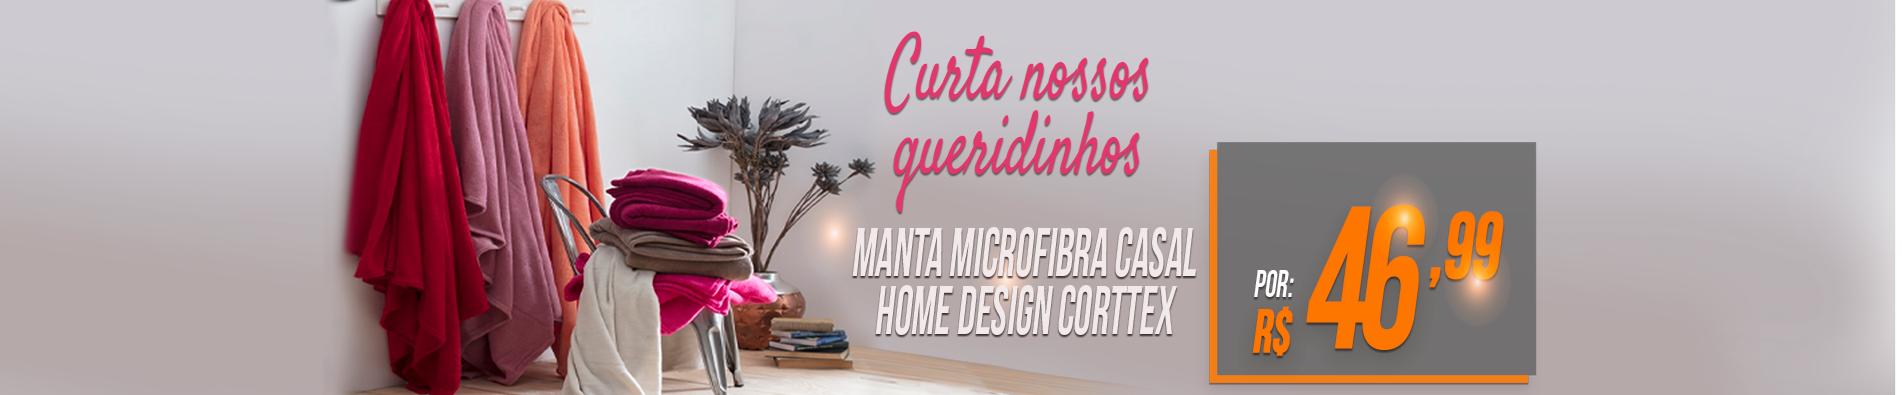 MANTA MICROFIBRA CASAL HOME DESIGN CORTTEX R$ 46,99